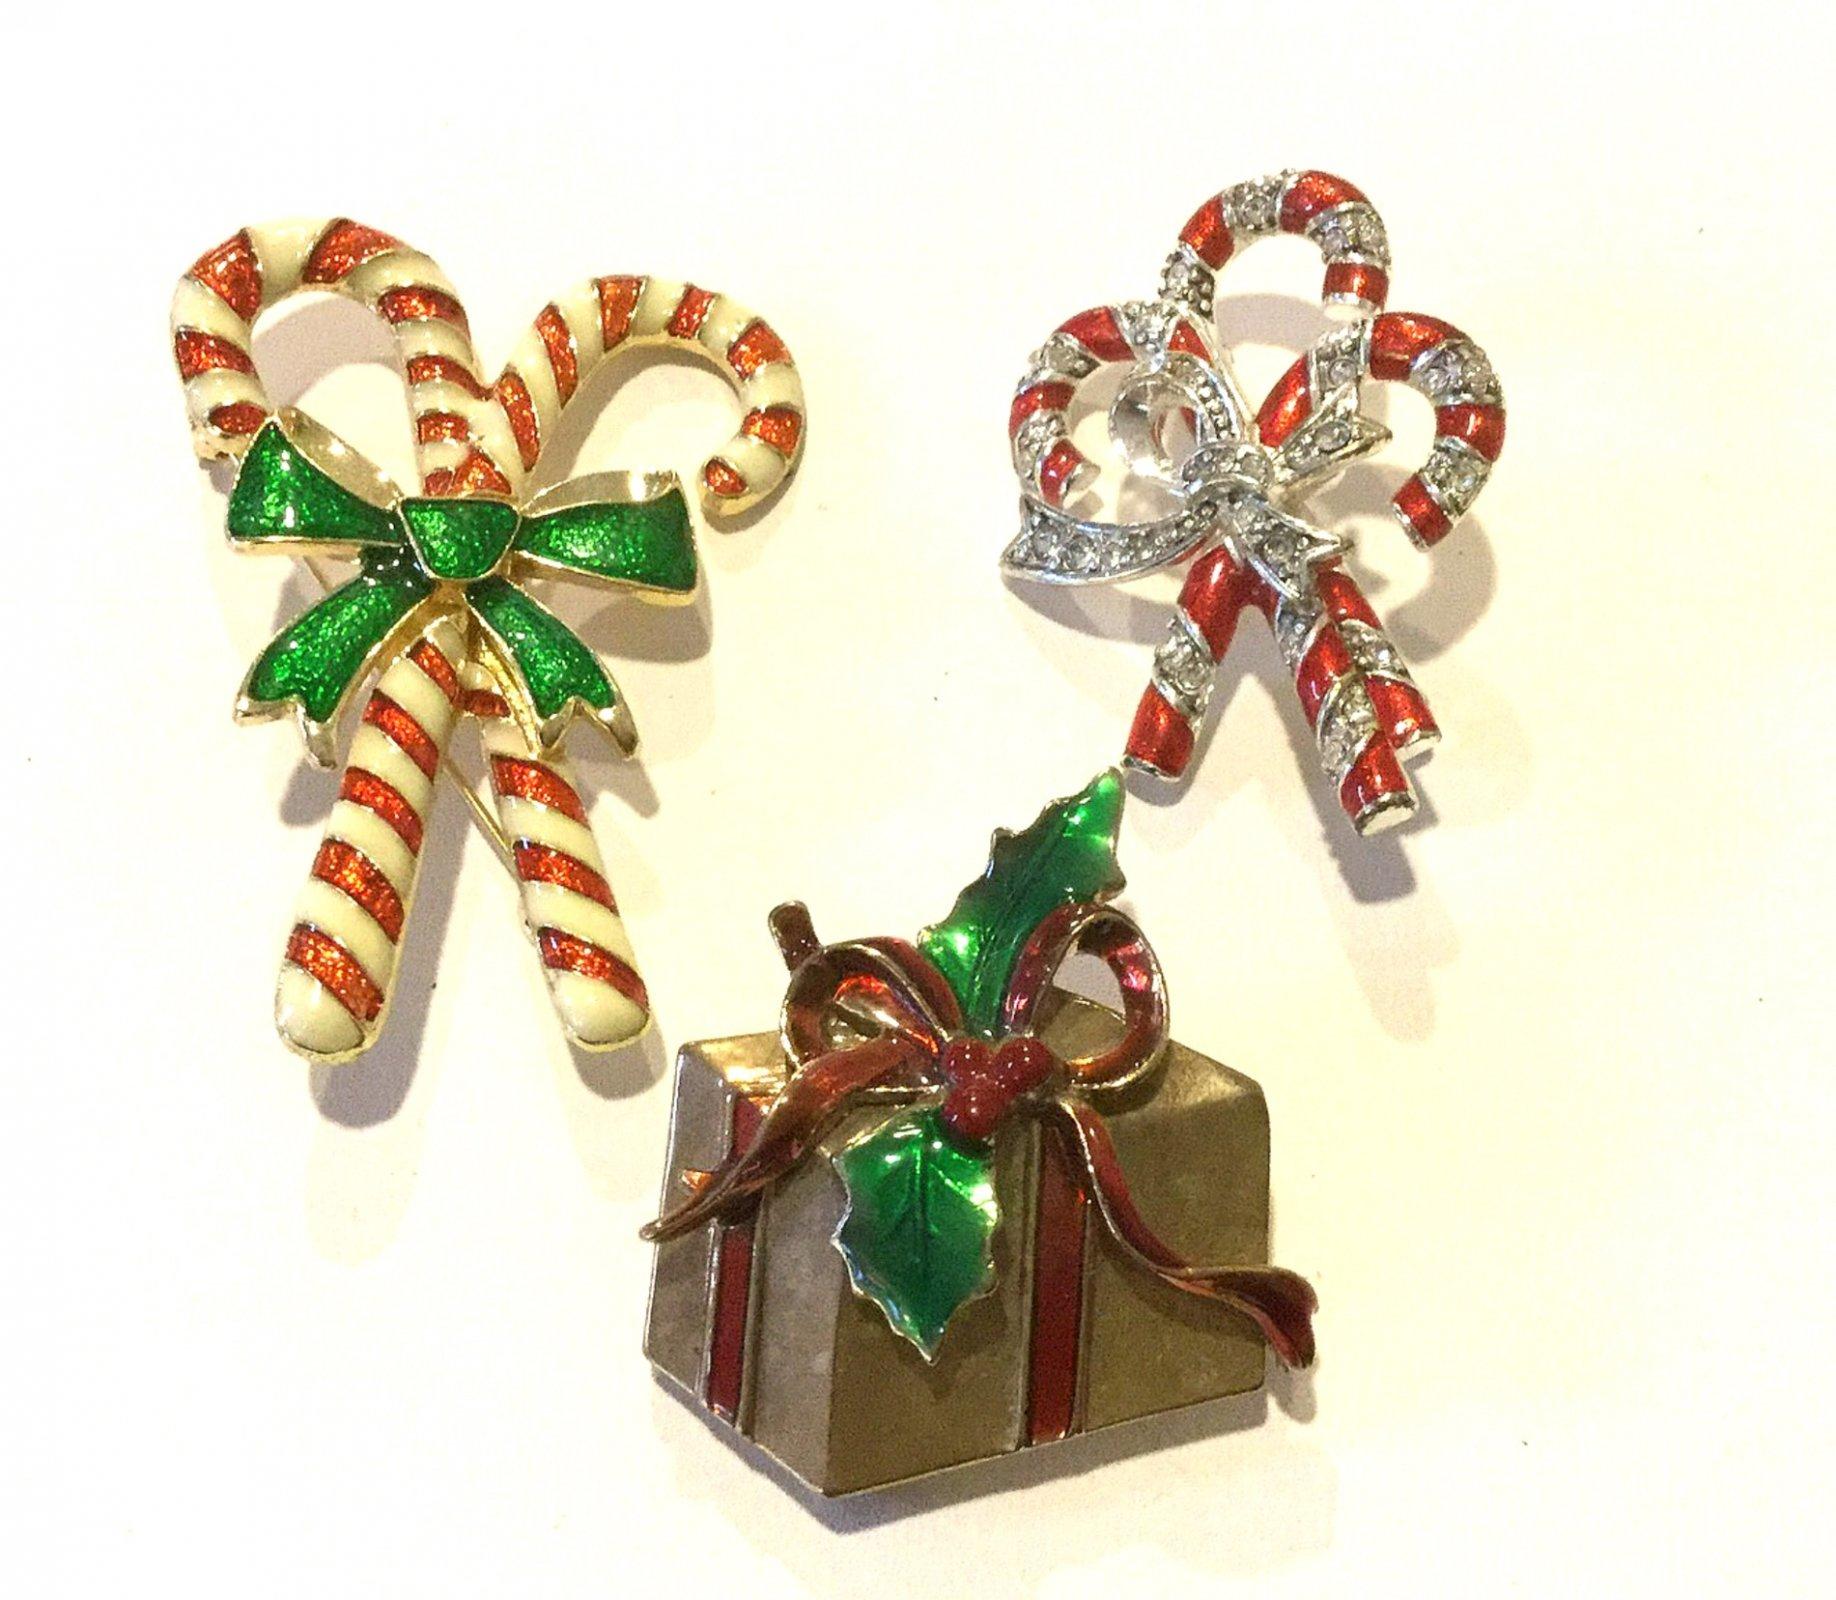 Christmas Candy Canes Gift THREE Vintage Rhinestone Enamel Costume Jewelry Pins